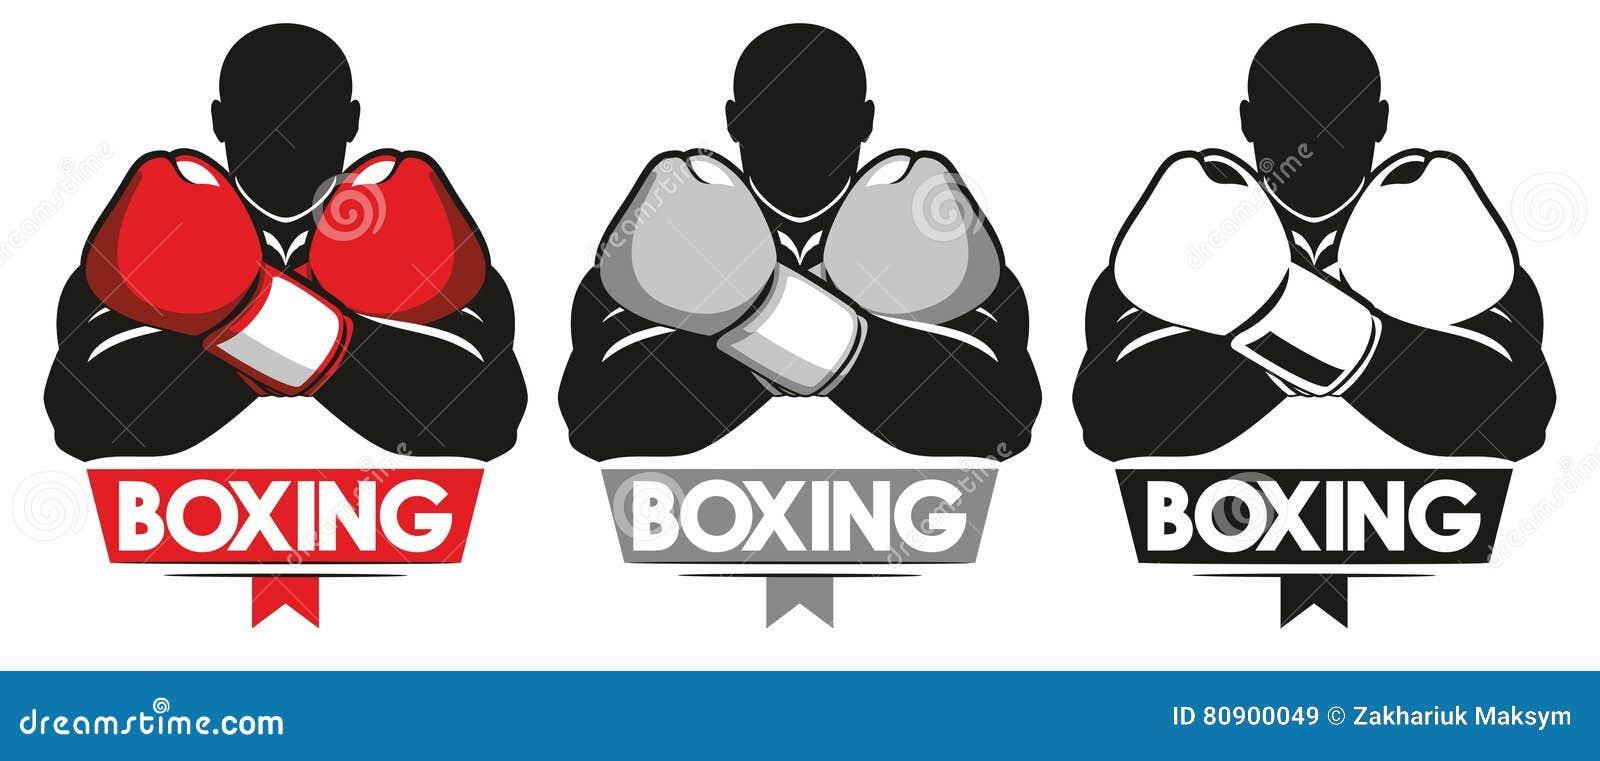 Boxing logo stock vector  Illustration of boxer